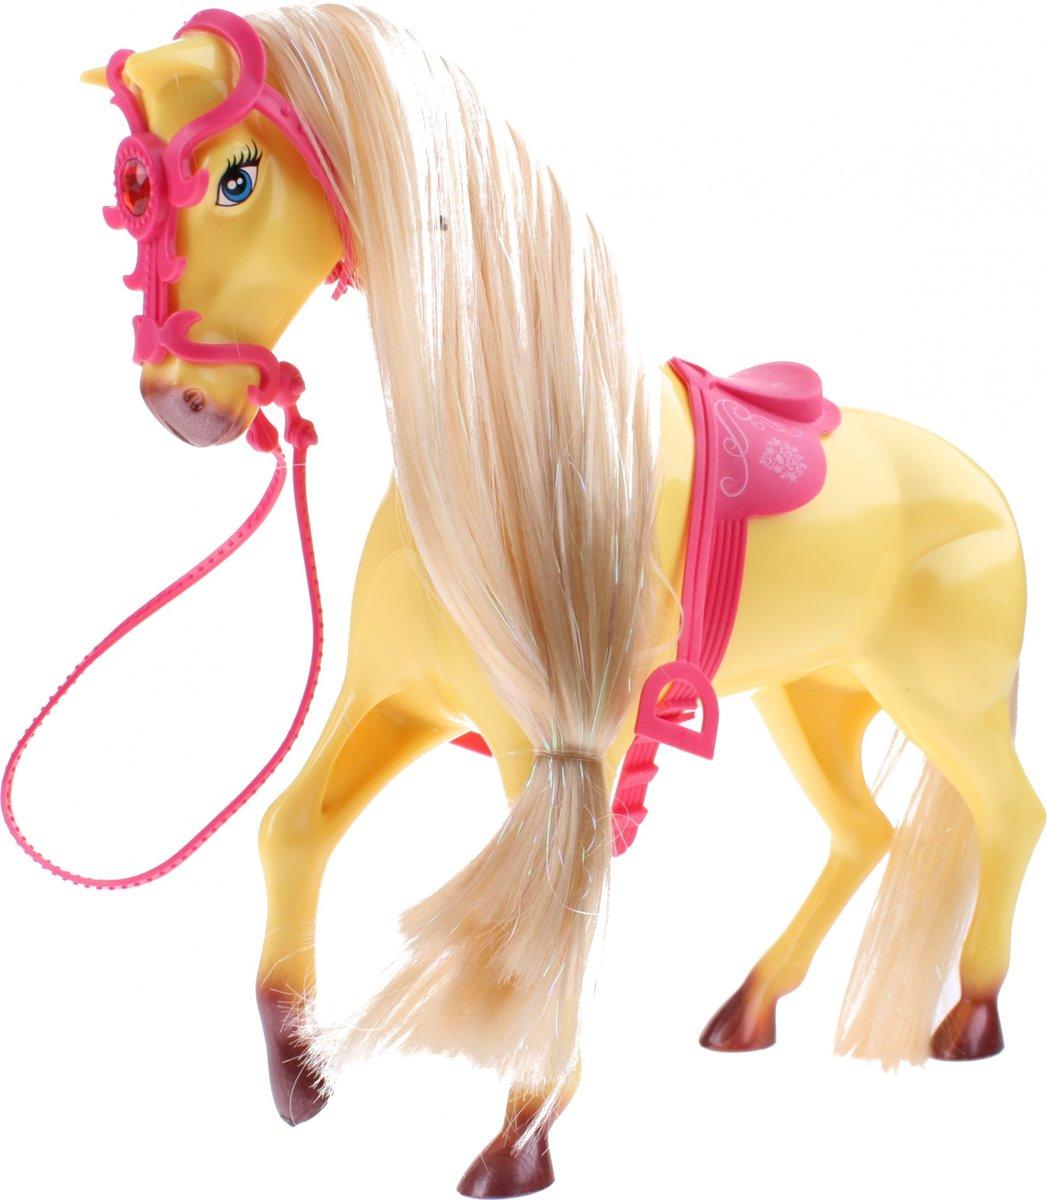 Toi-toys Sofie Paard Met Borstel 25 Cm Geel kopen